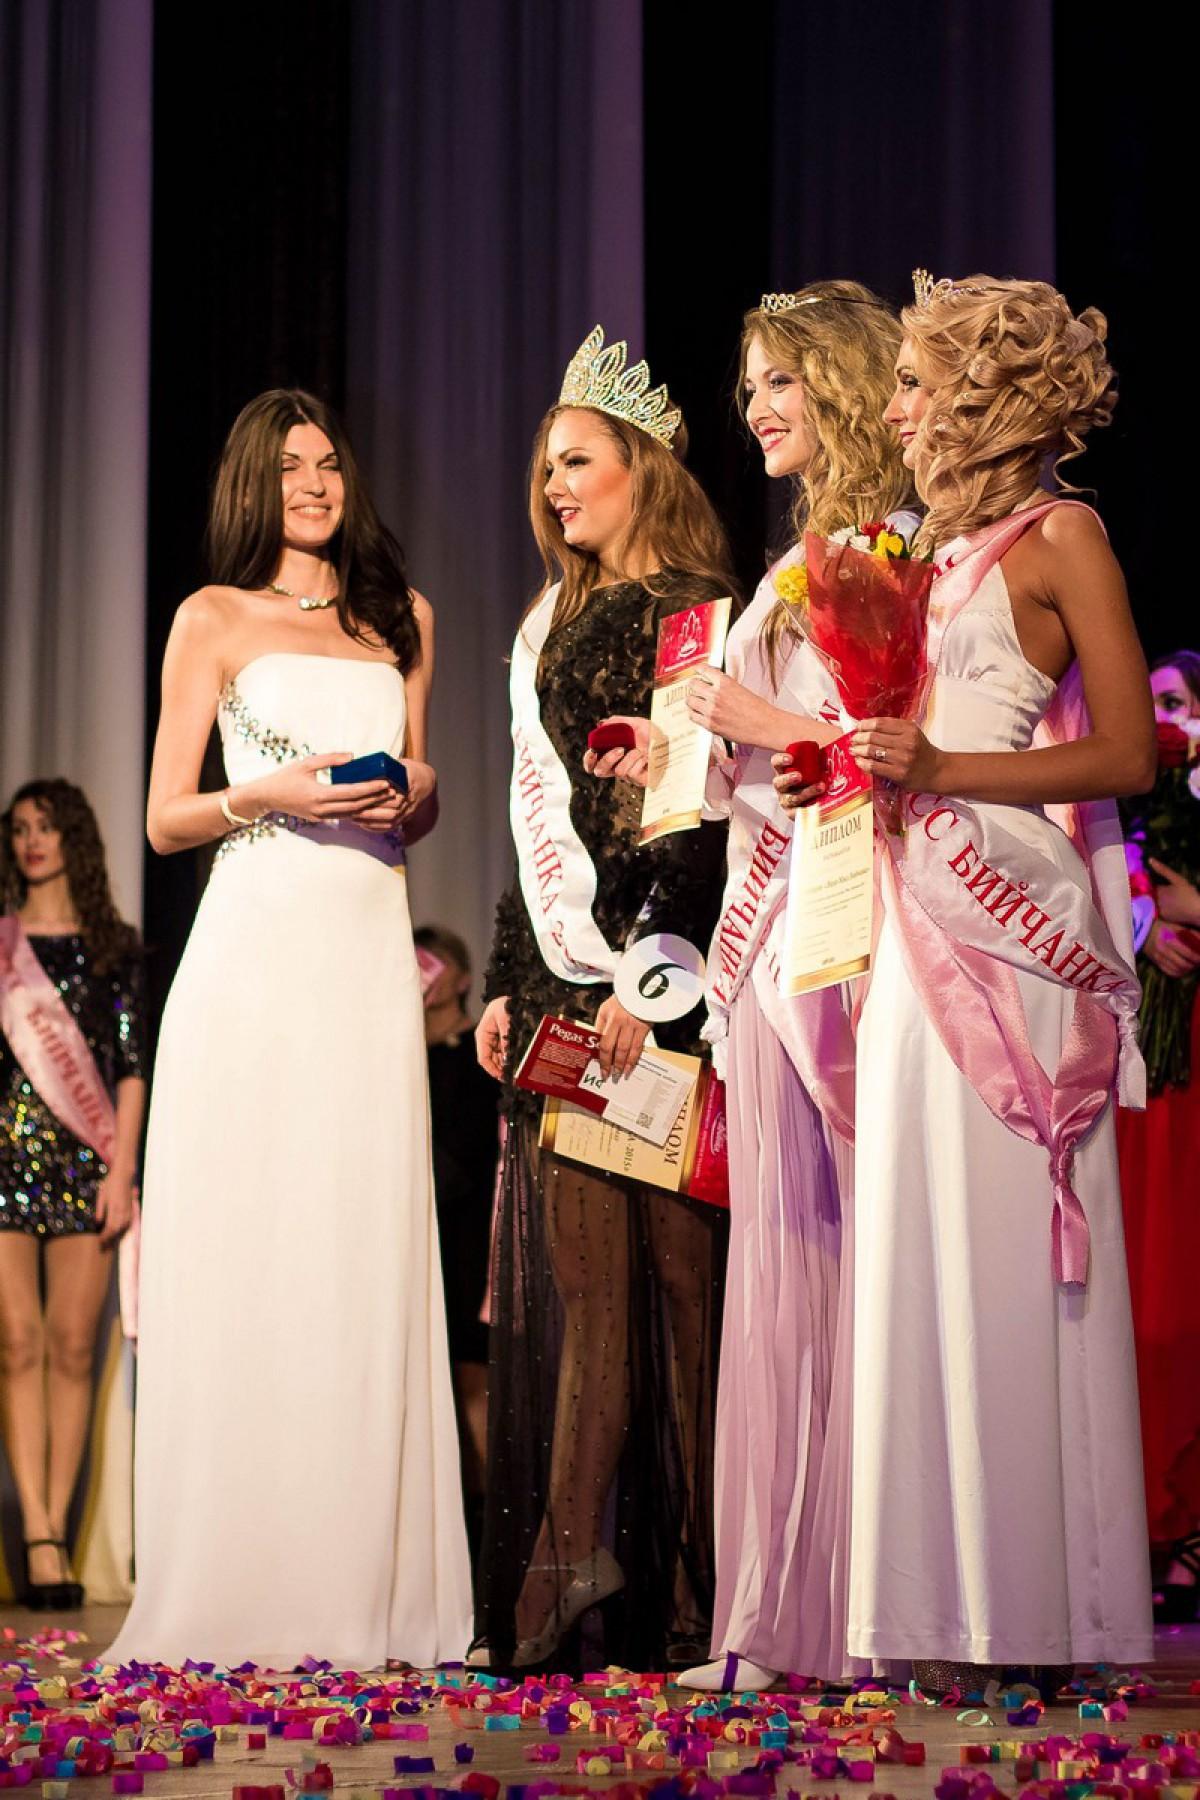 Конкурс «Мисс бийчанка-2015». 8 марта 2015